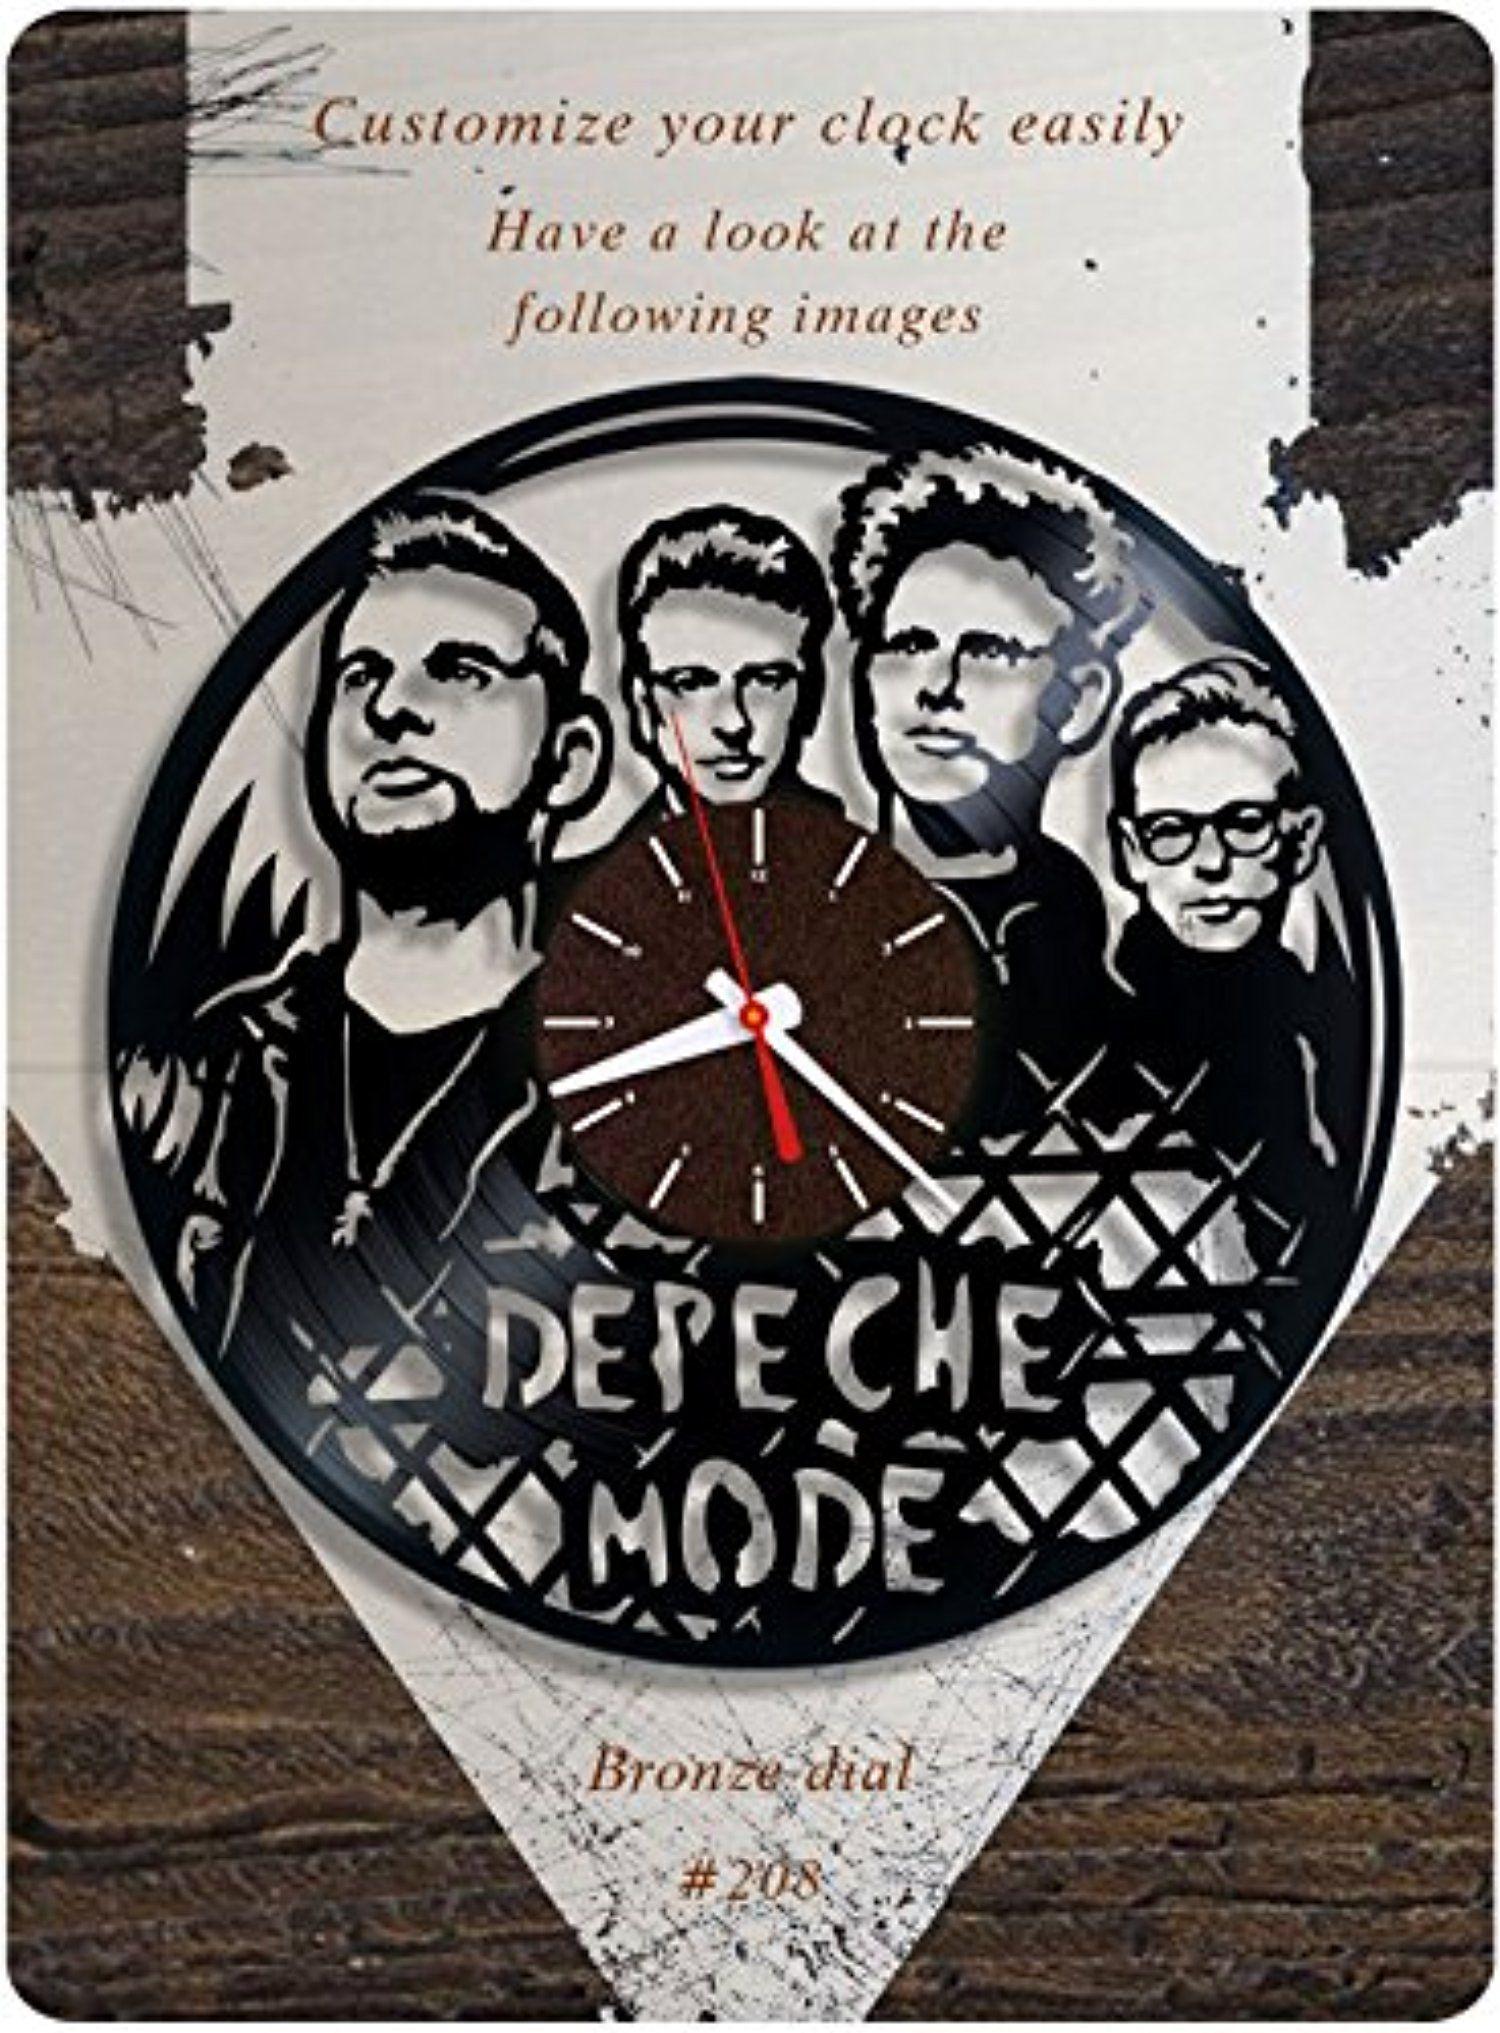 Depeche Mode Vinyl Clock Vinyl Wall Clock Vinyl Record Clock The Most Popular Electronic Band Dave Gahan Mar Vinyl Record Clock Record Clock Vinyl Record Art